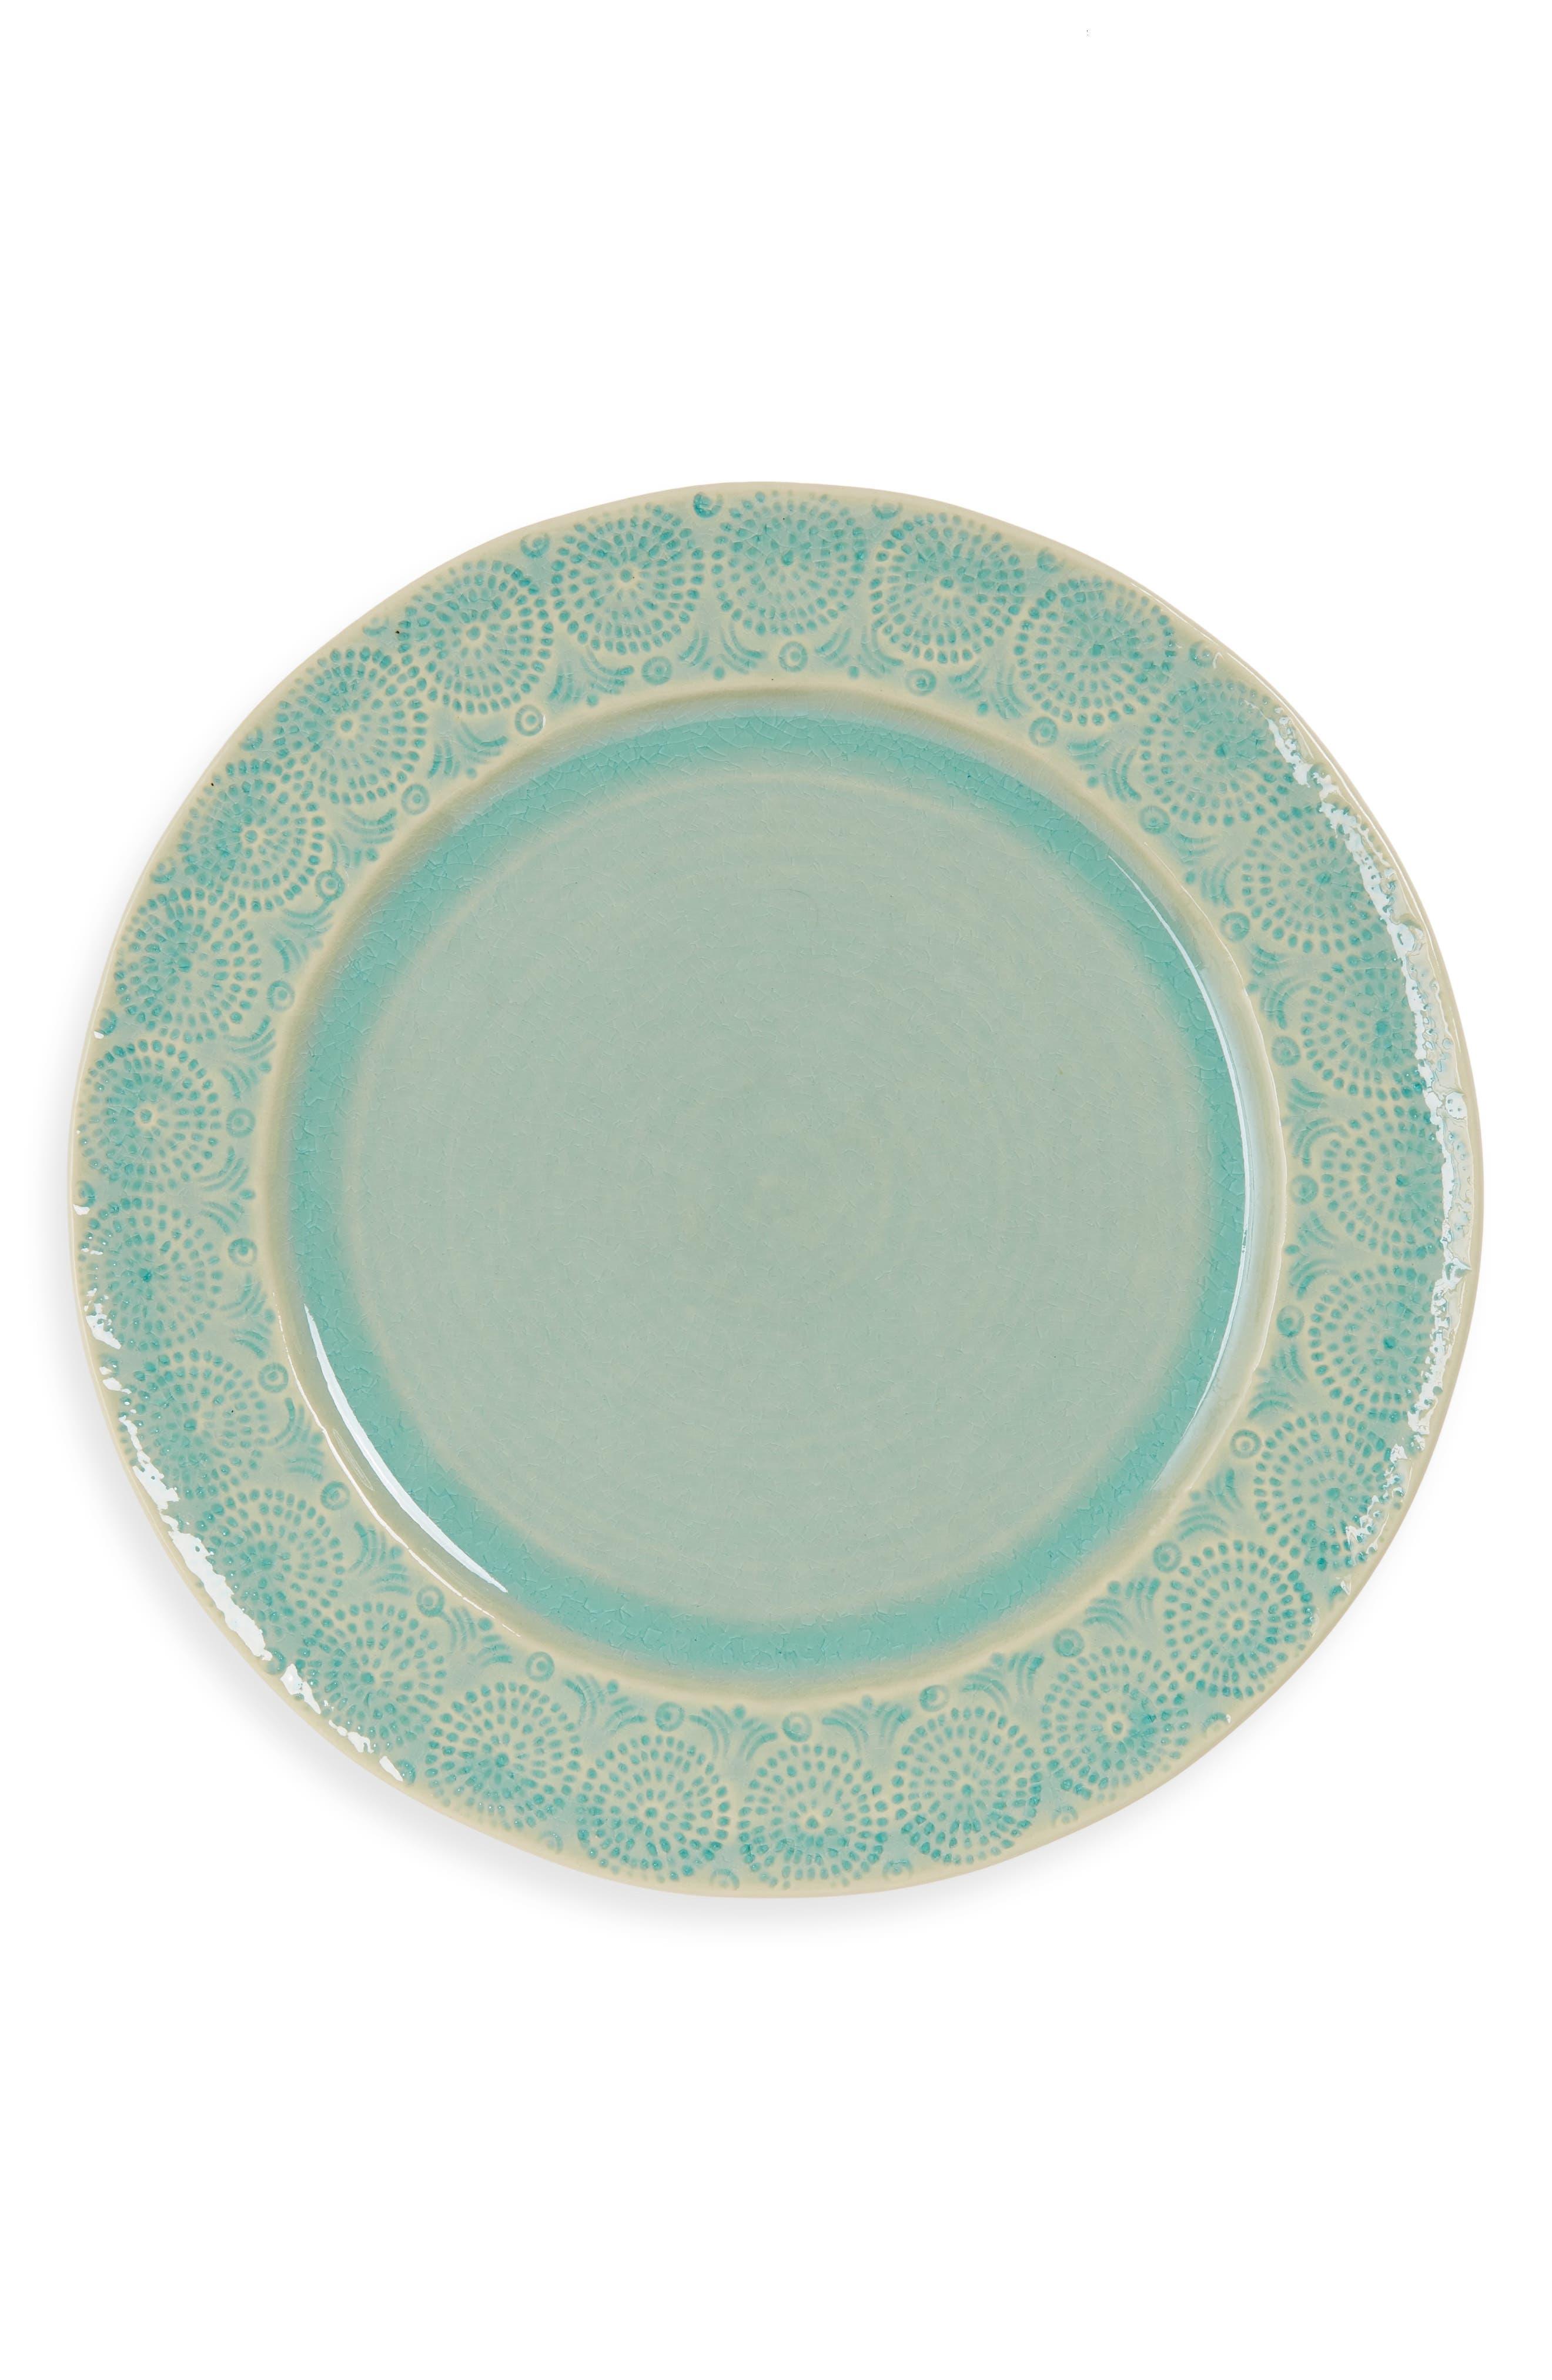 Anthropologie Old Havana Dinner Plate  sc 1 st  Nordstrom & Dinnerware: Dishes Plates \u0026 Bowls